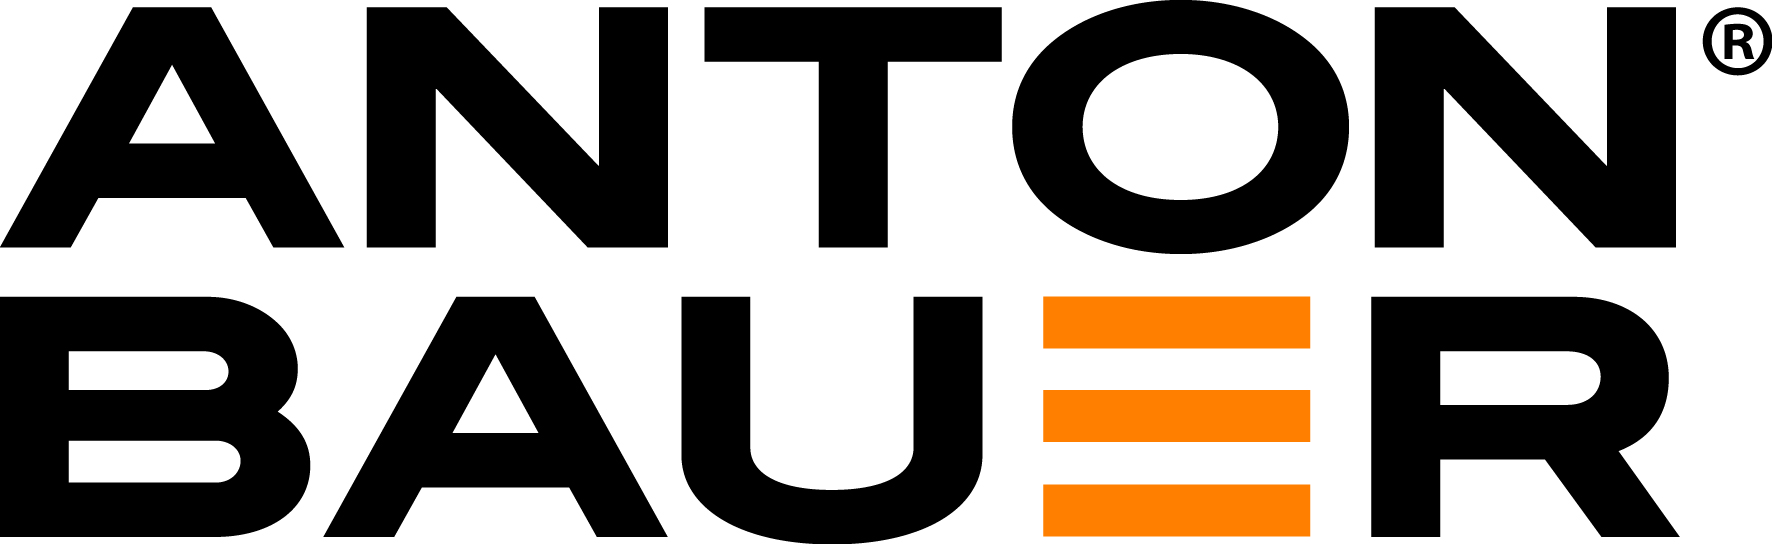 Anton Bauer logo